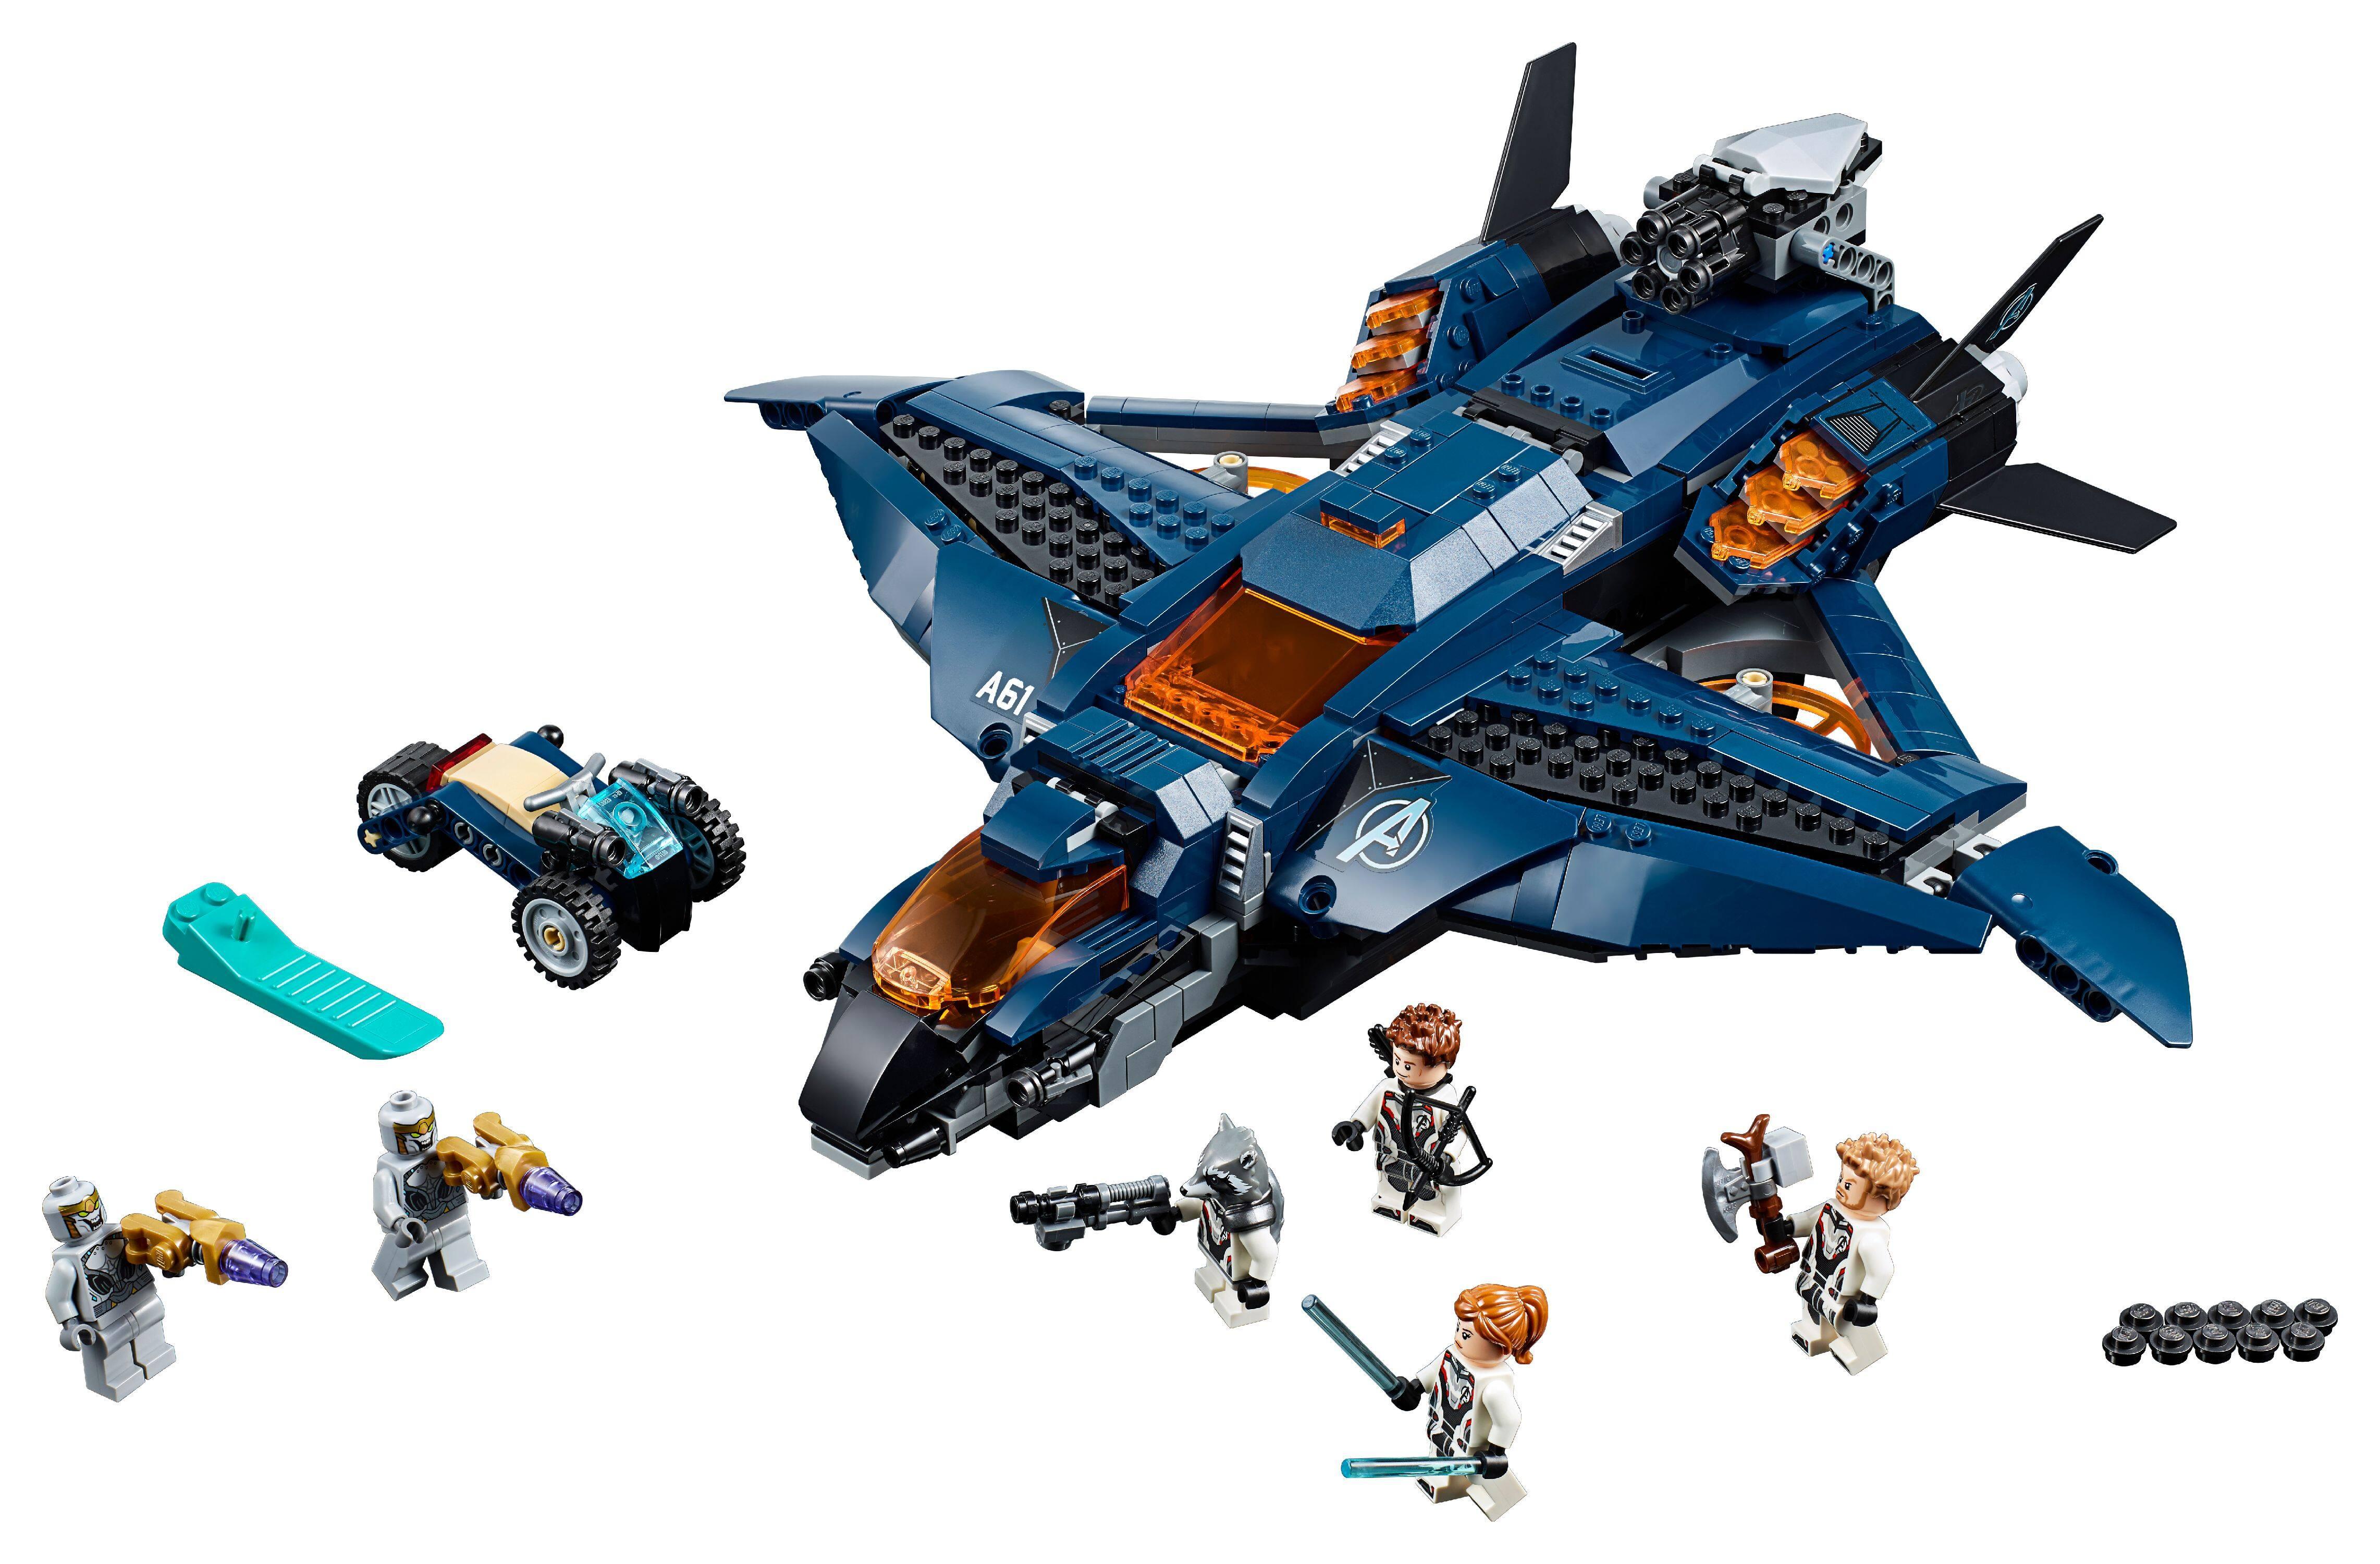 838-Piece LEGO Marvel Avengers Ultimate Quinjet Building Kit